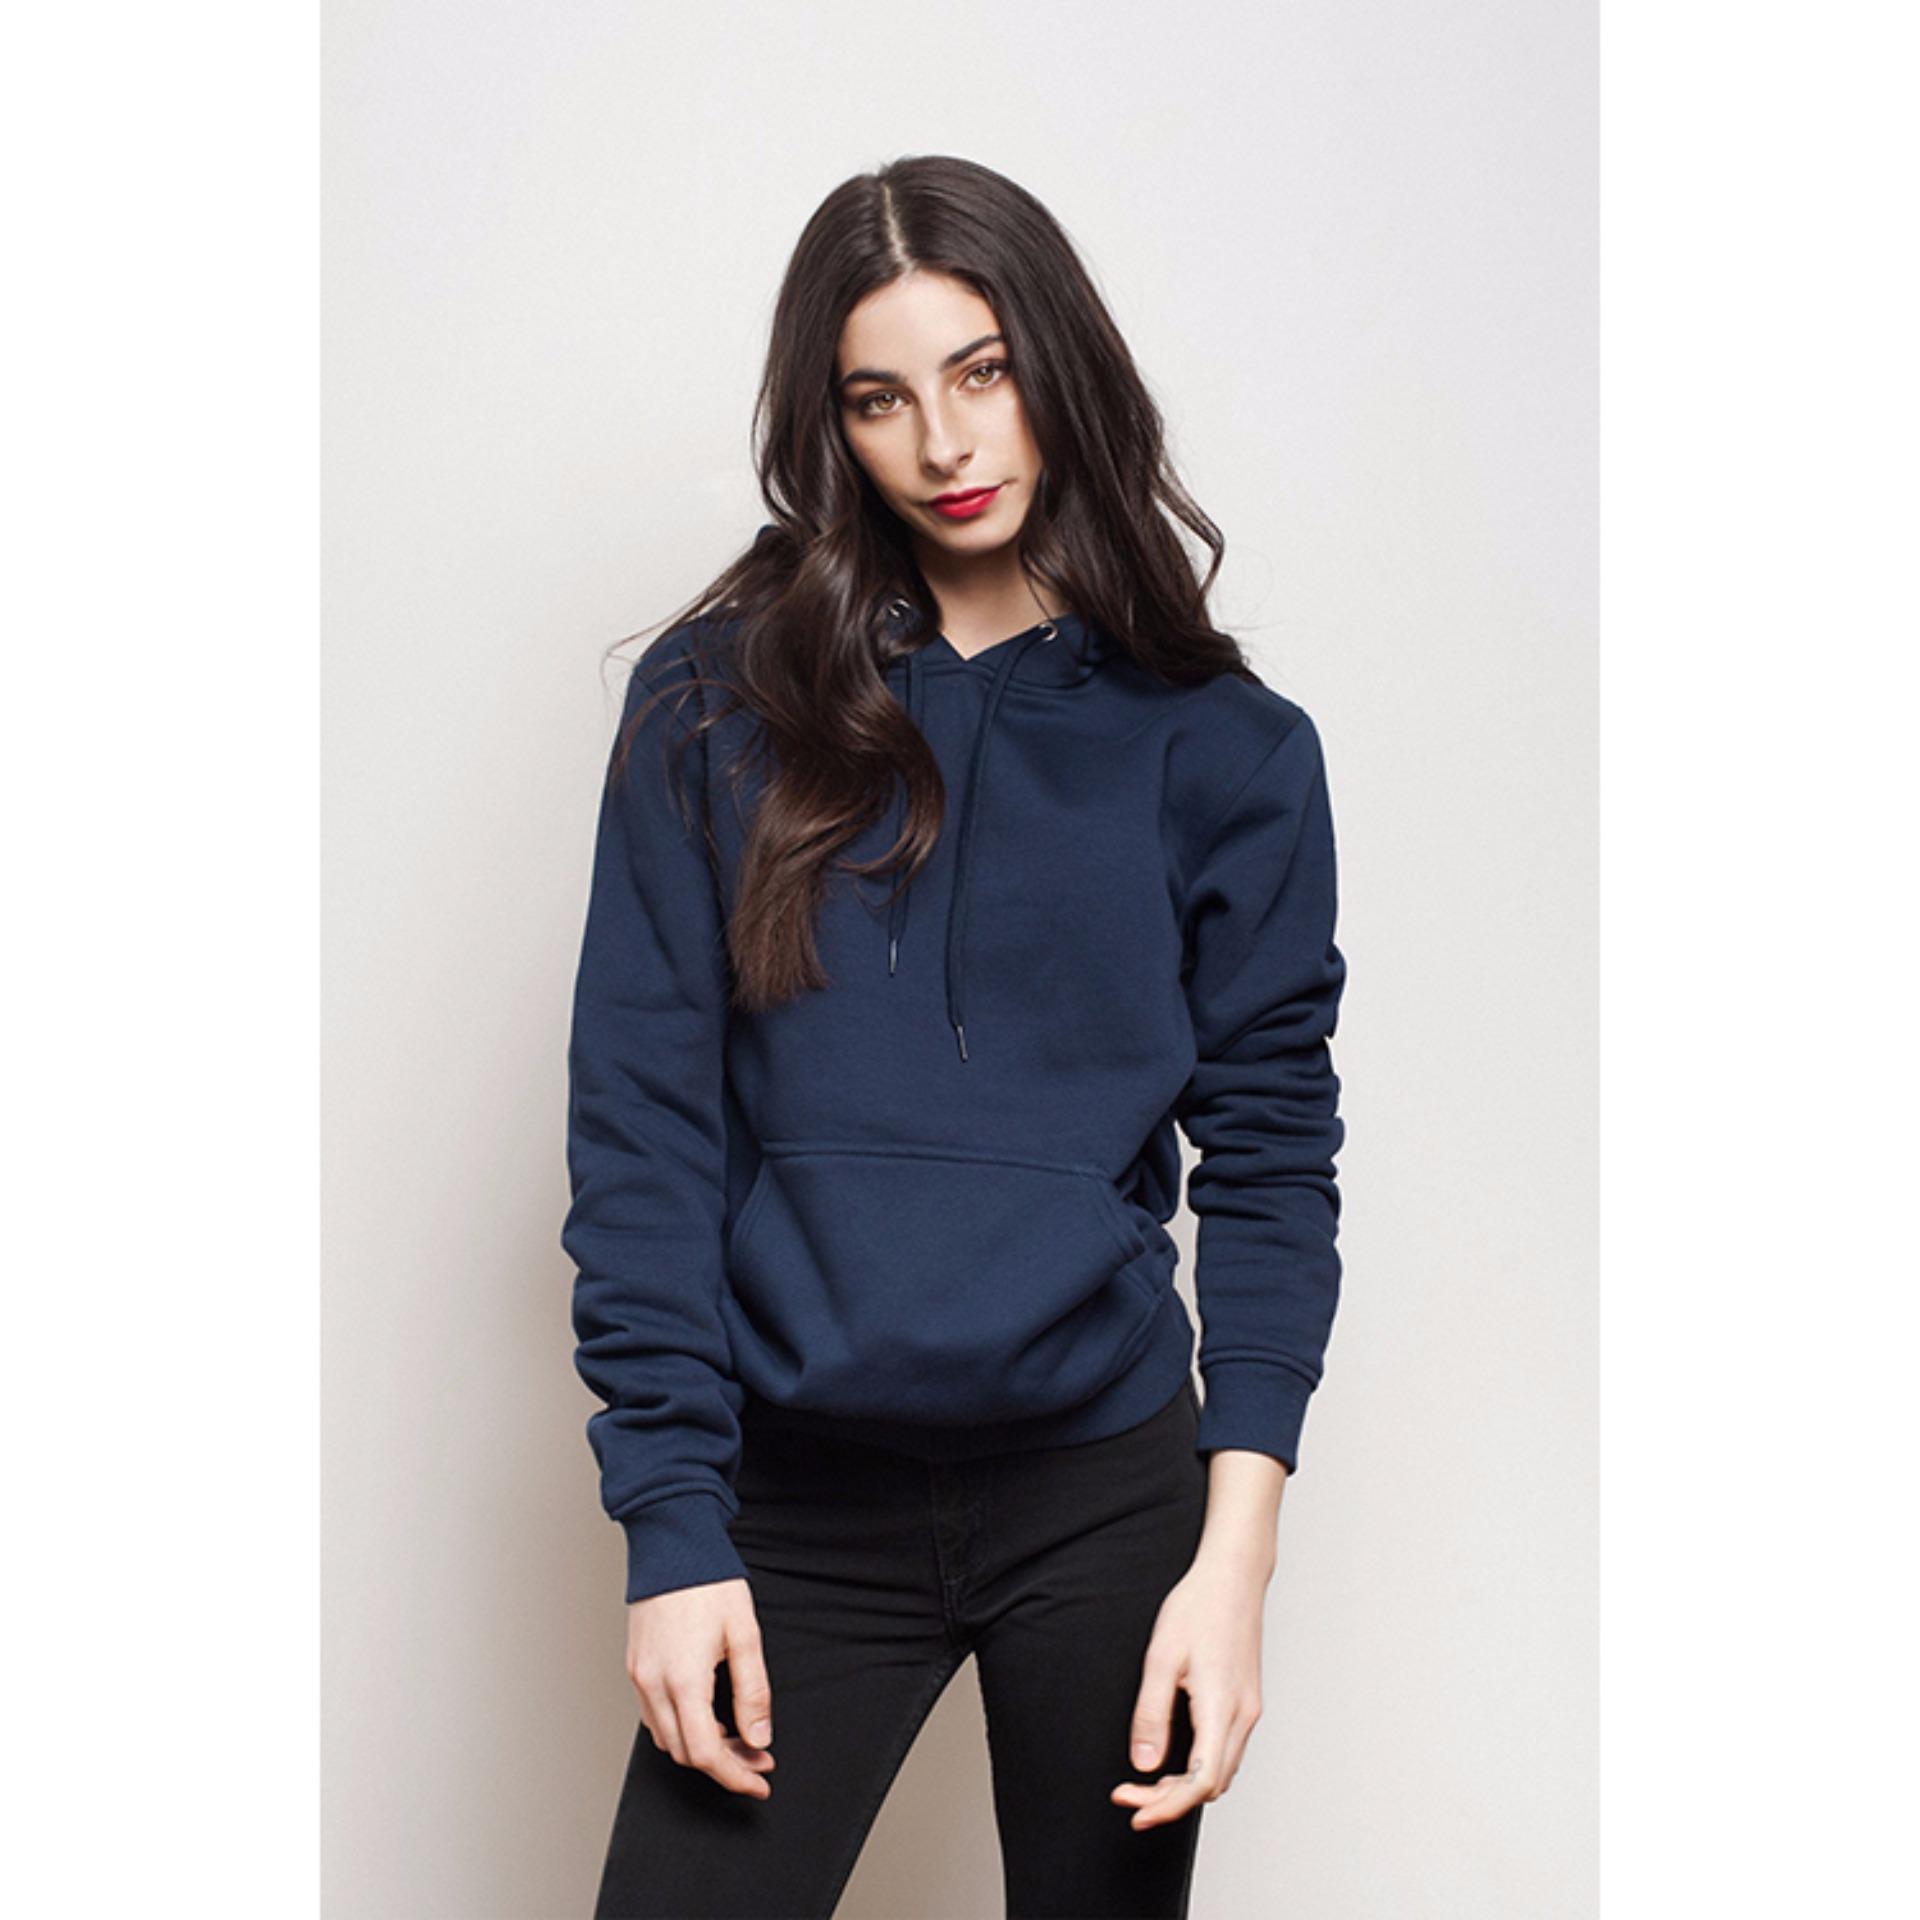 Jual Kaosbro Jaket Hoodie Polos Navy Blue Wanita Import